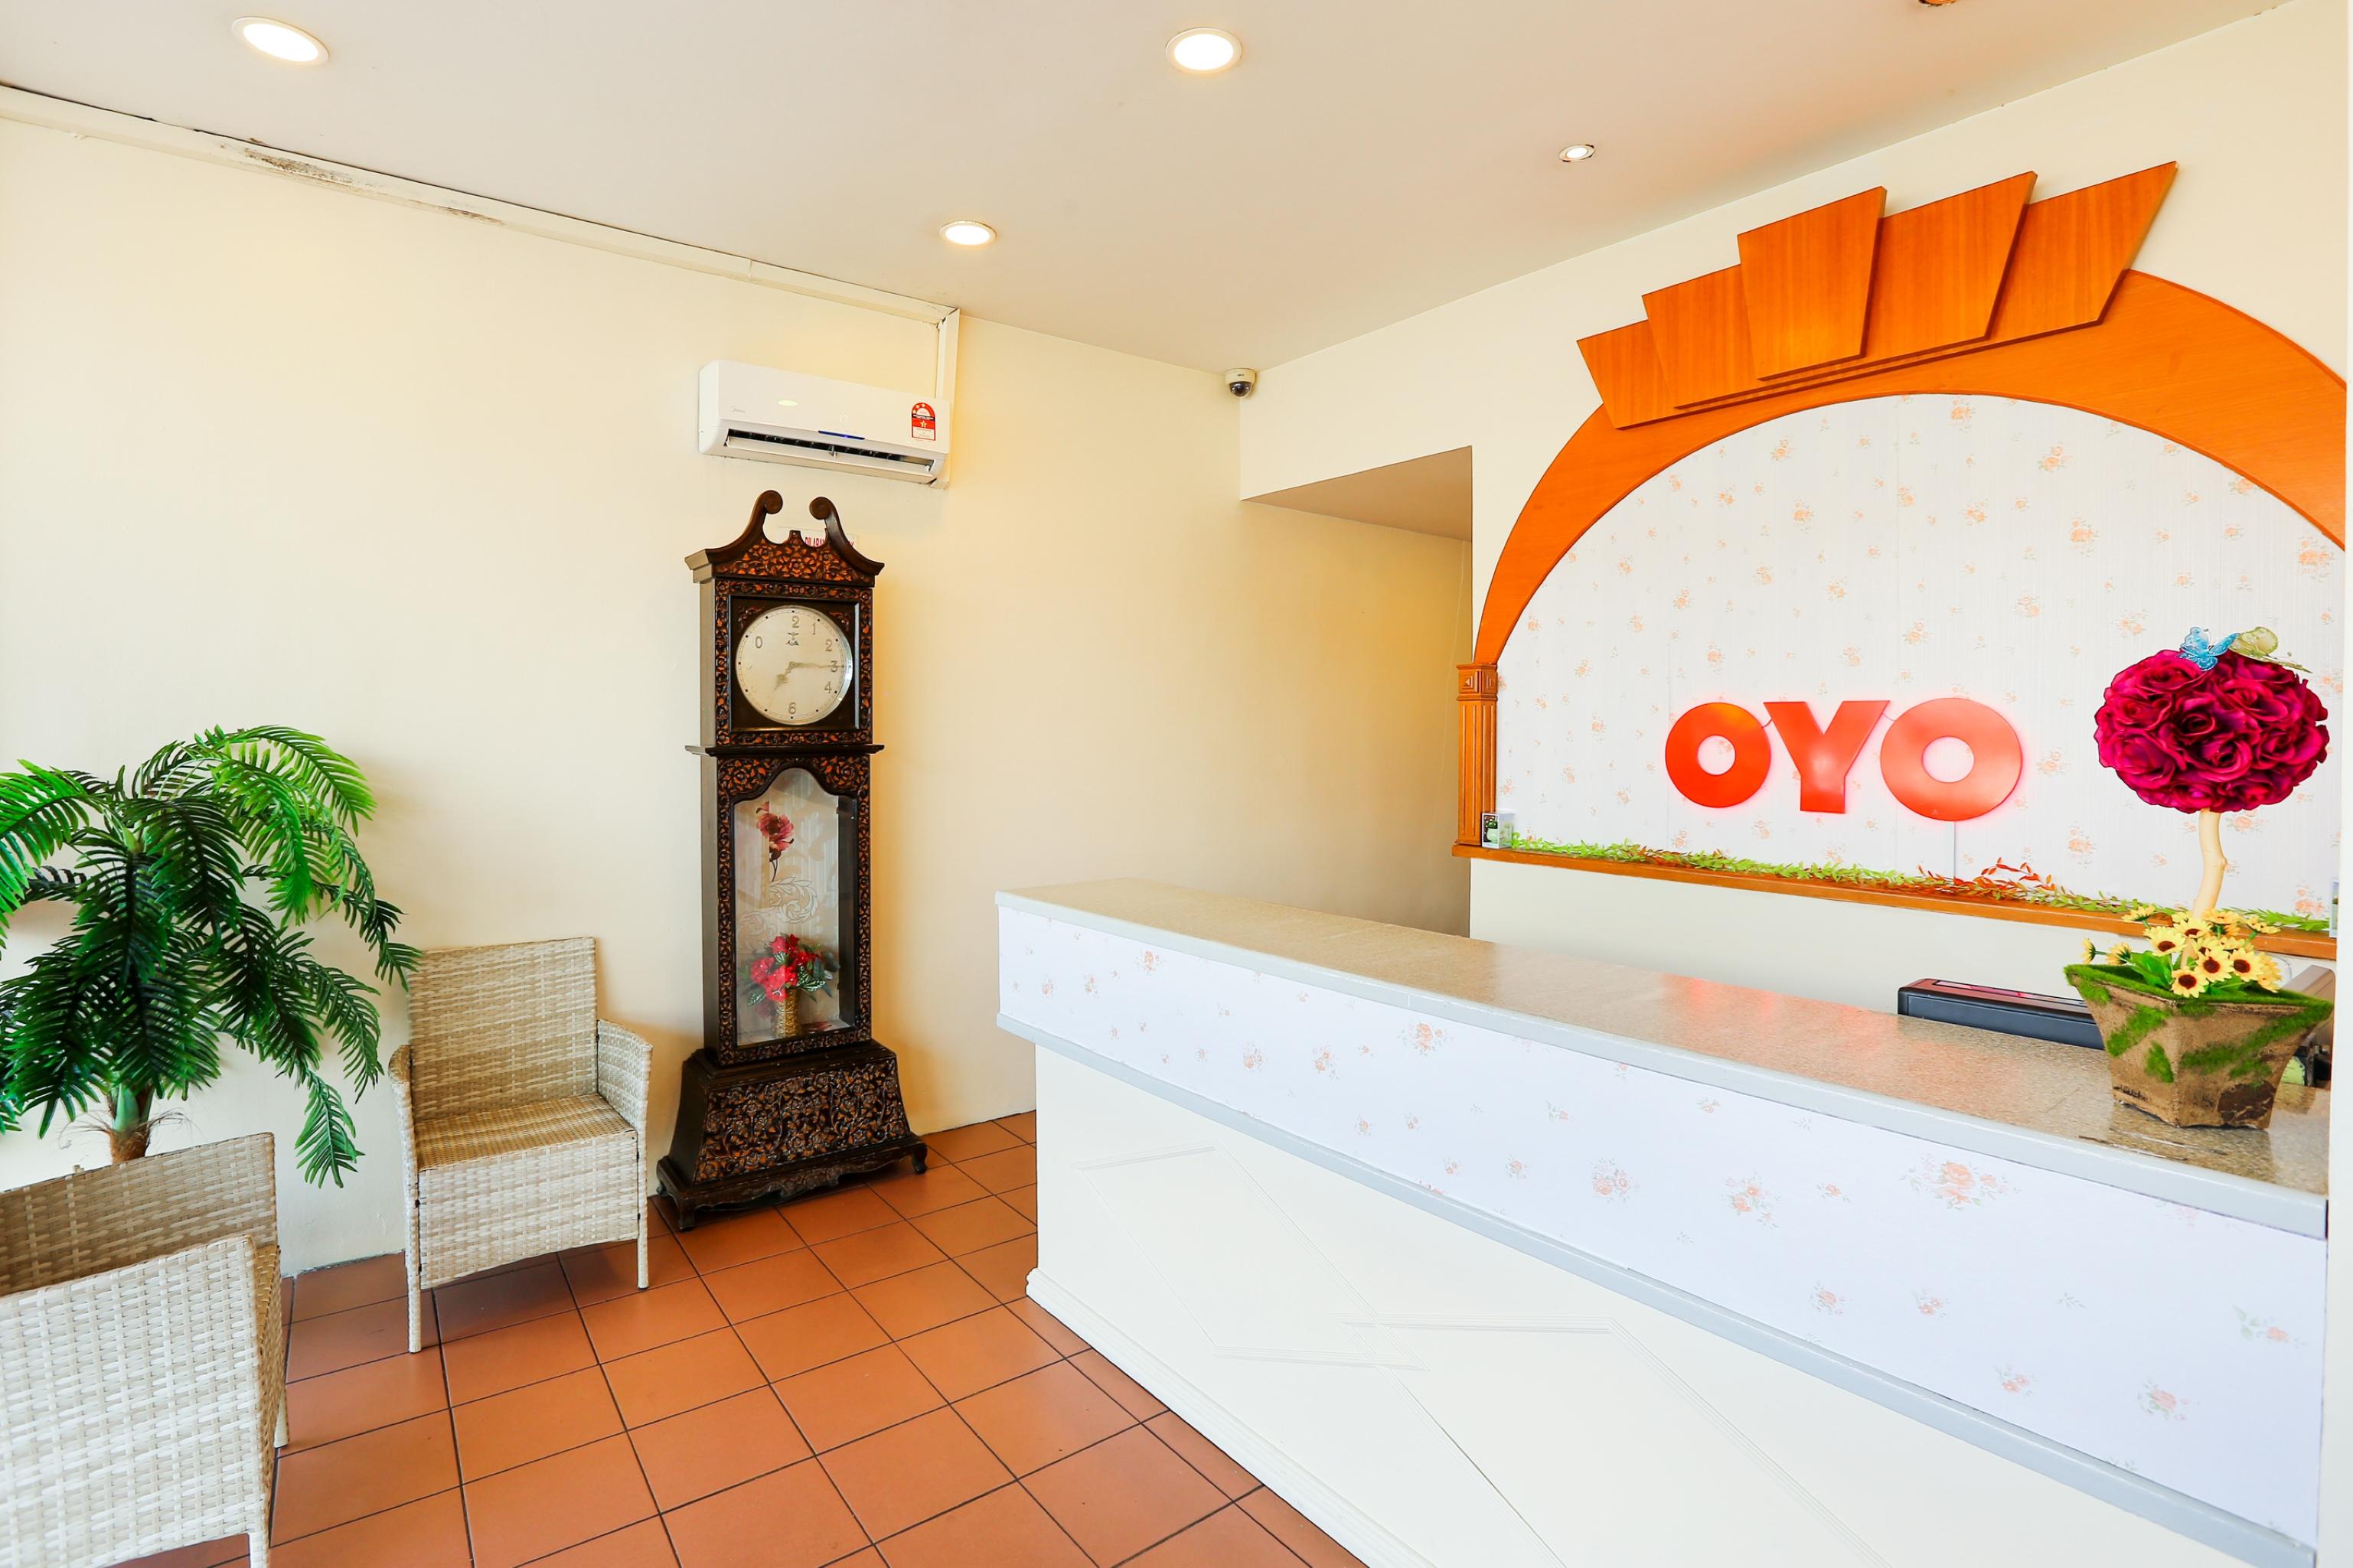 OYO 89638 Hotel Mandarin Inn, Segamat